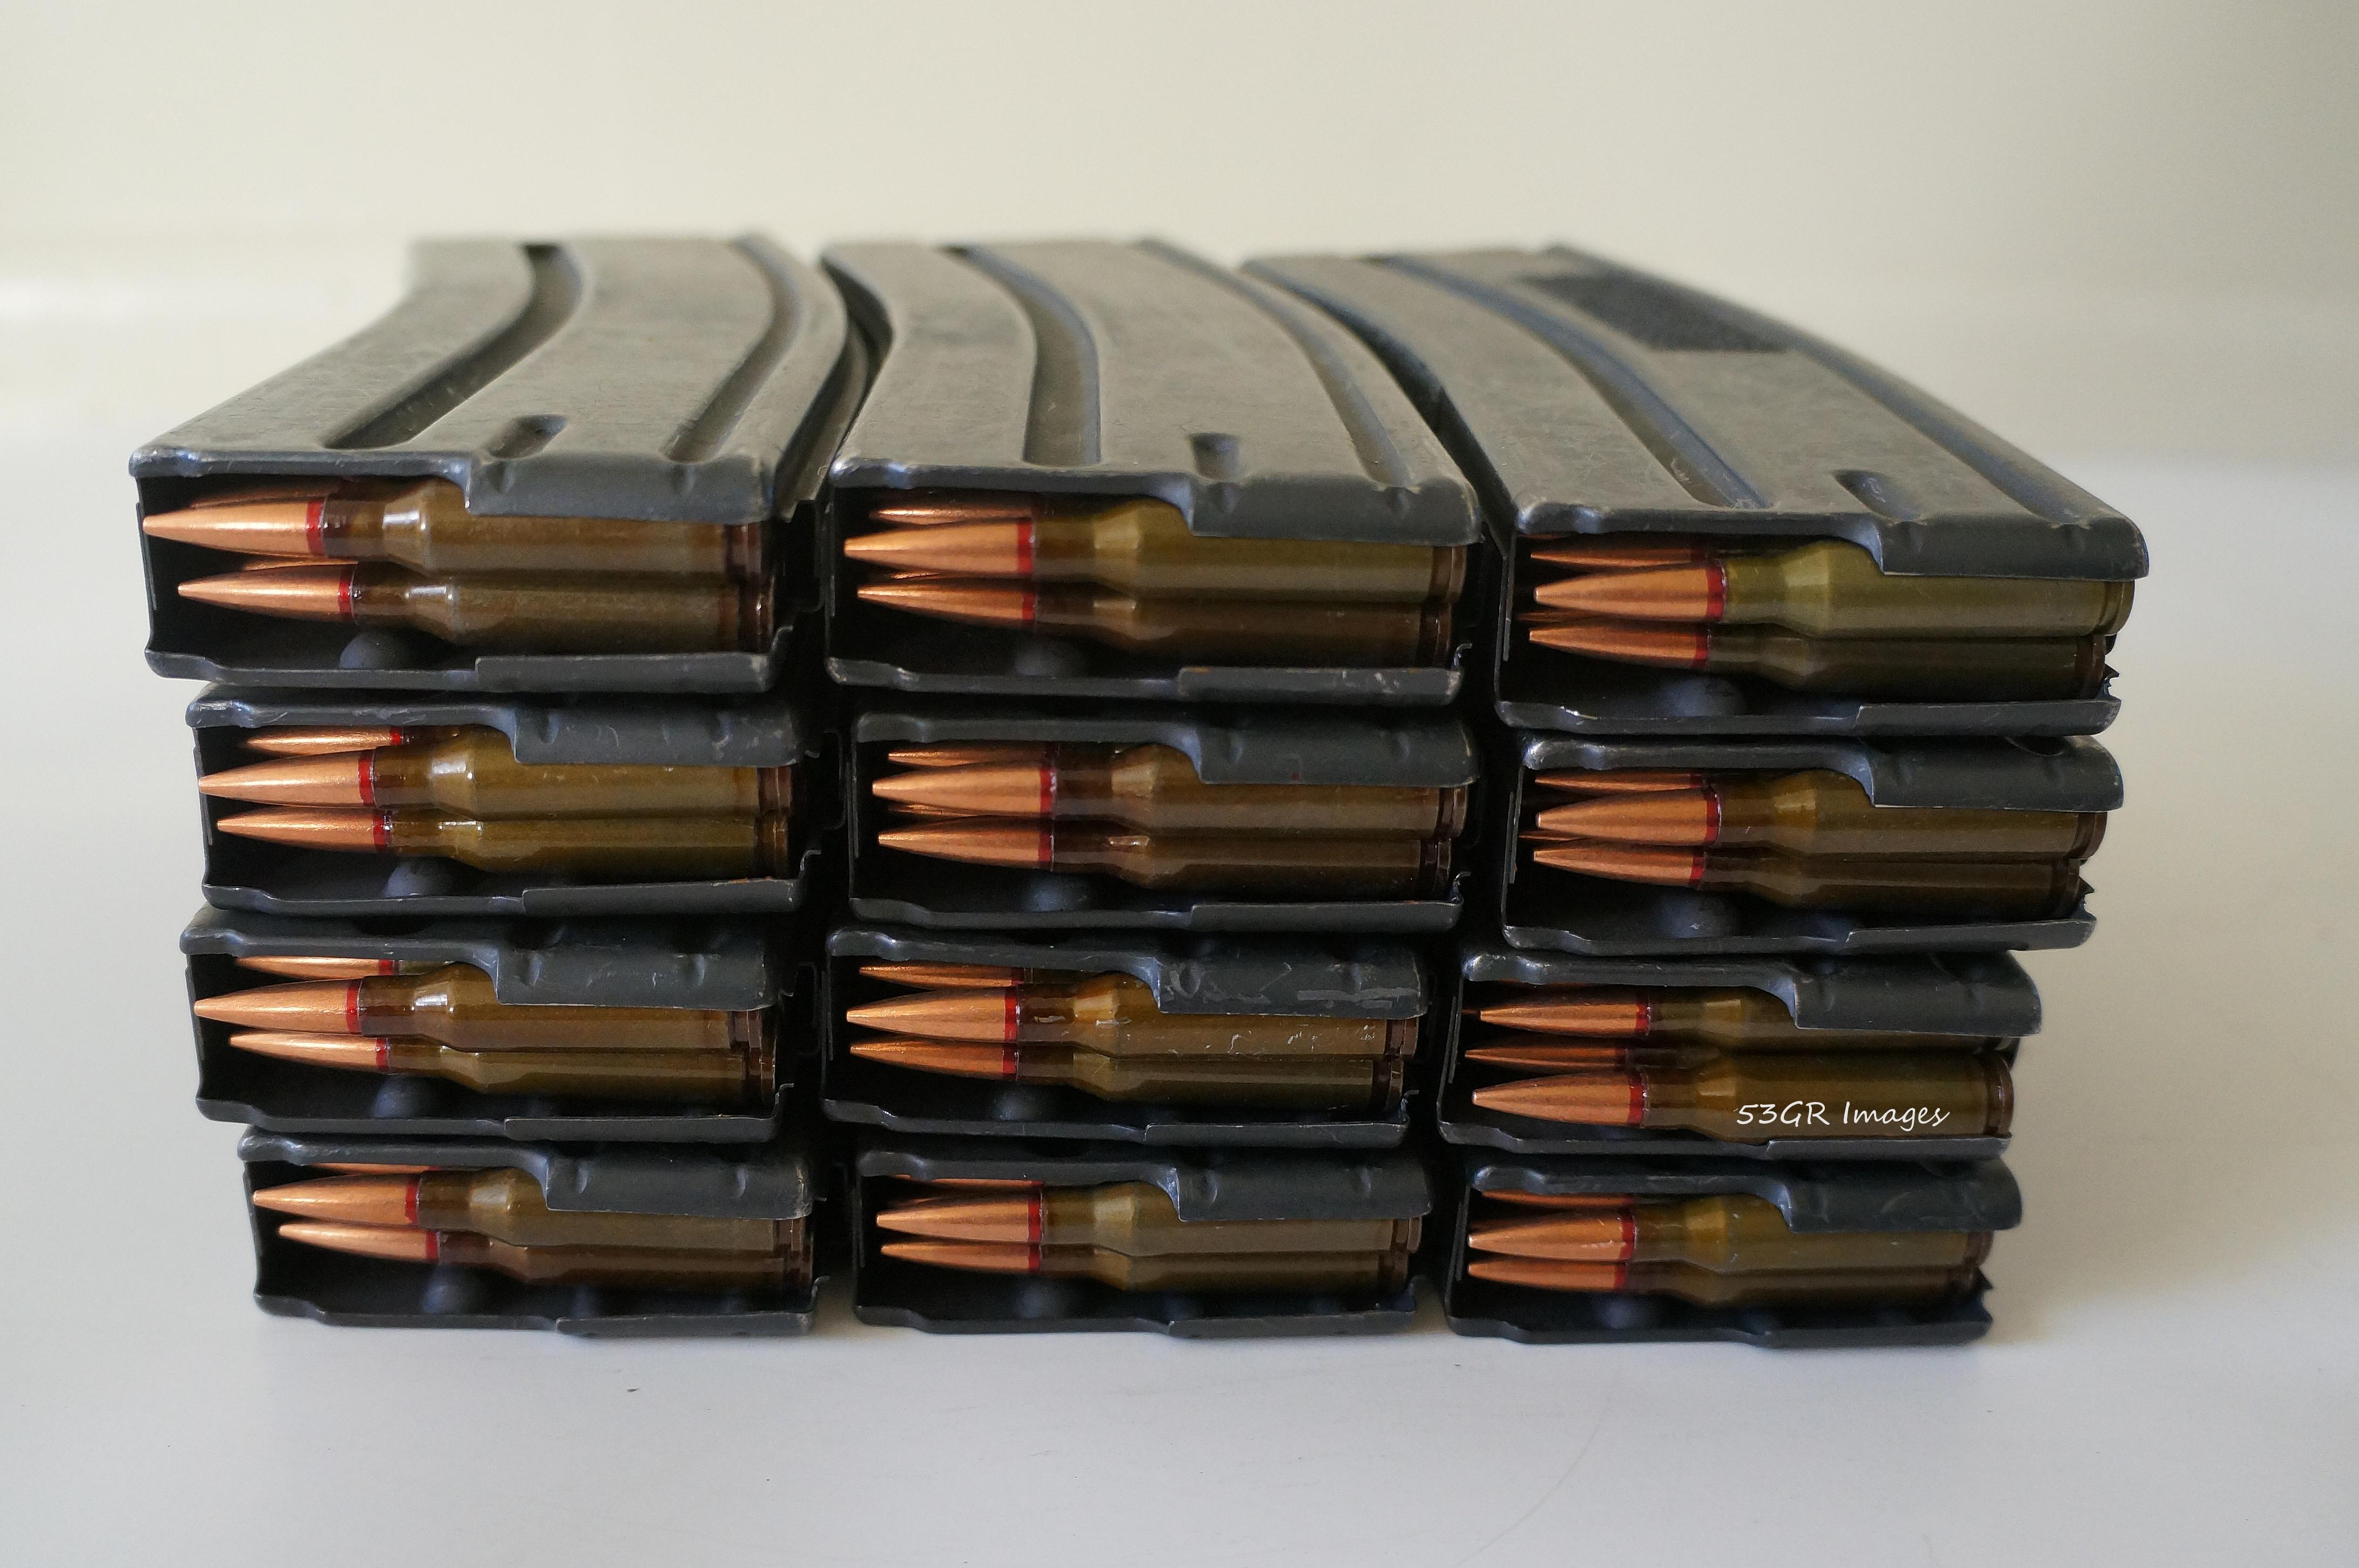 ASC 5.45 magazines